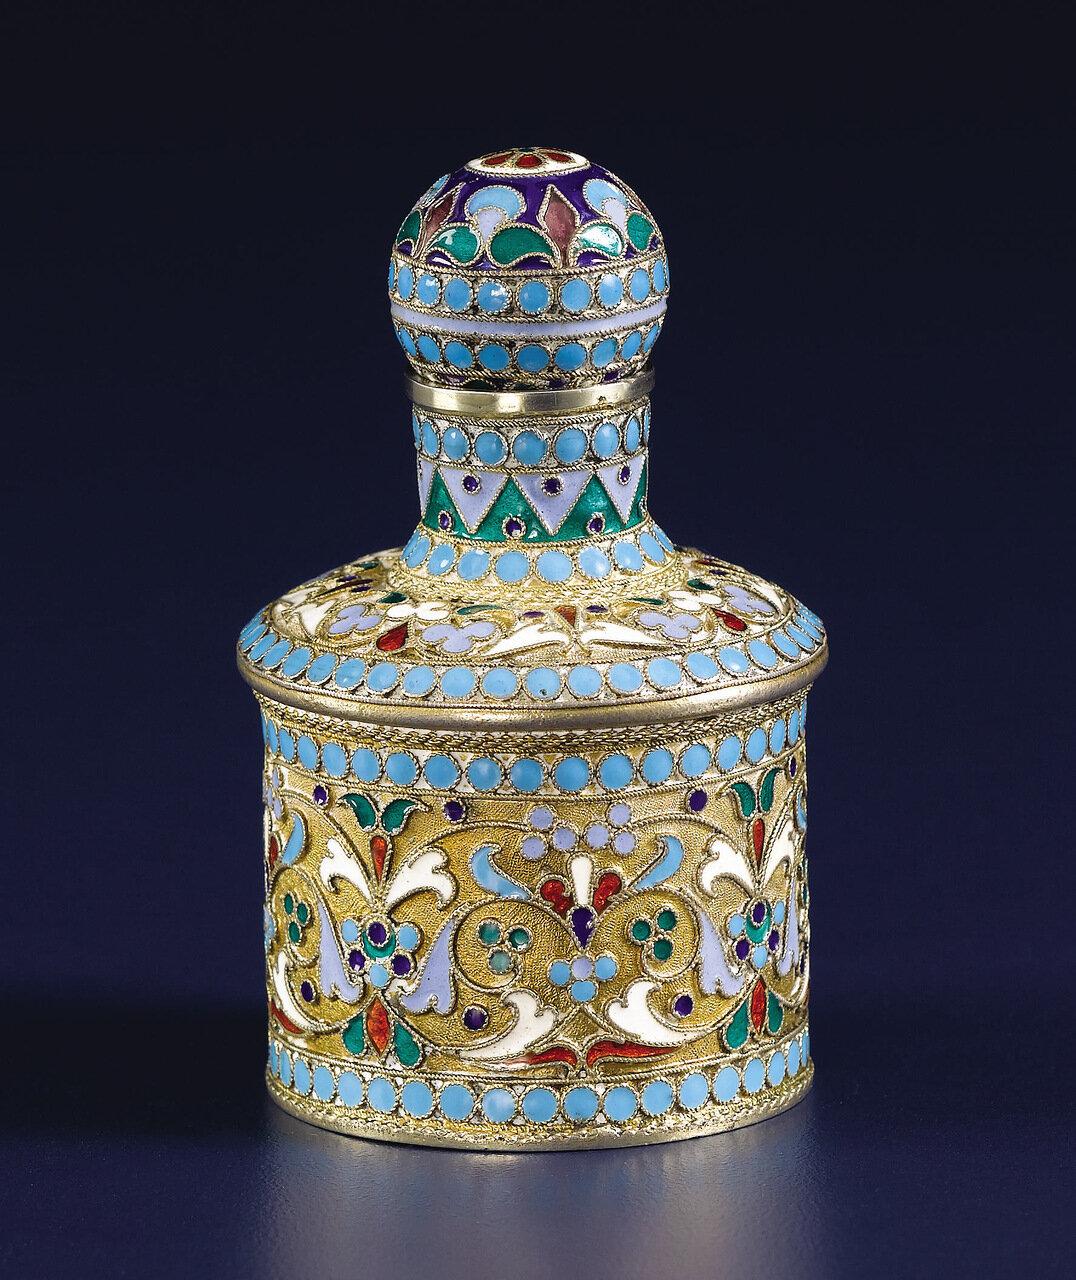 Русское антикварное серебро 0_11bce3_3691c613_XXXL